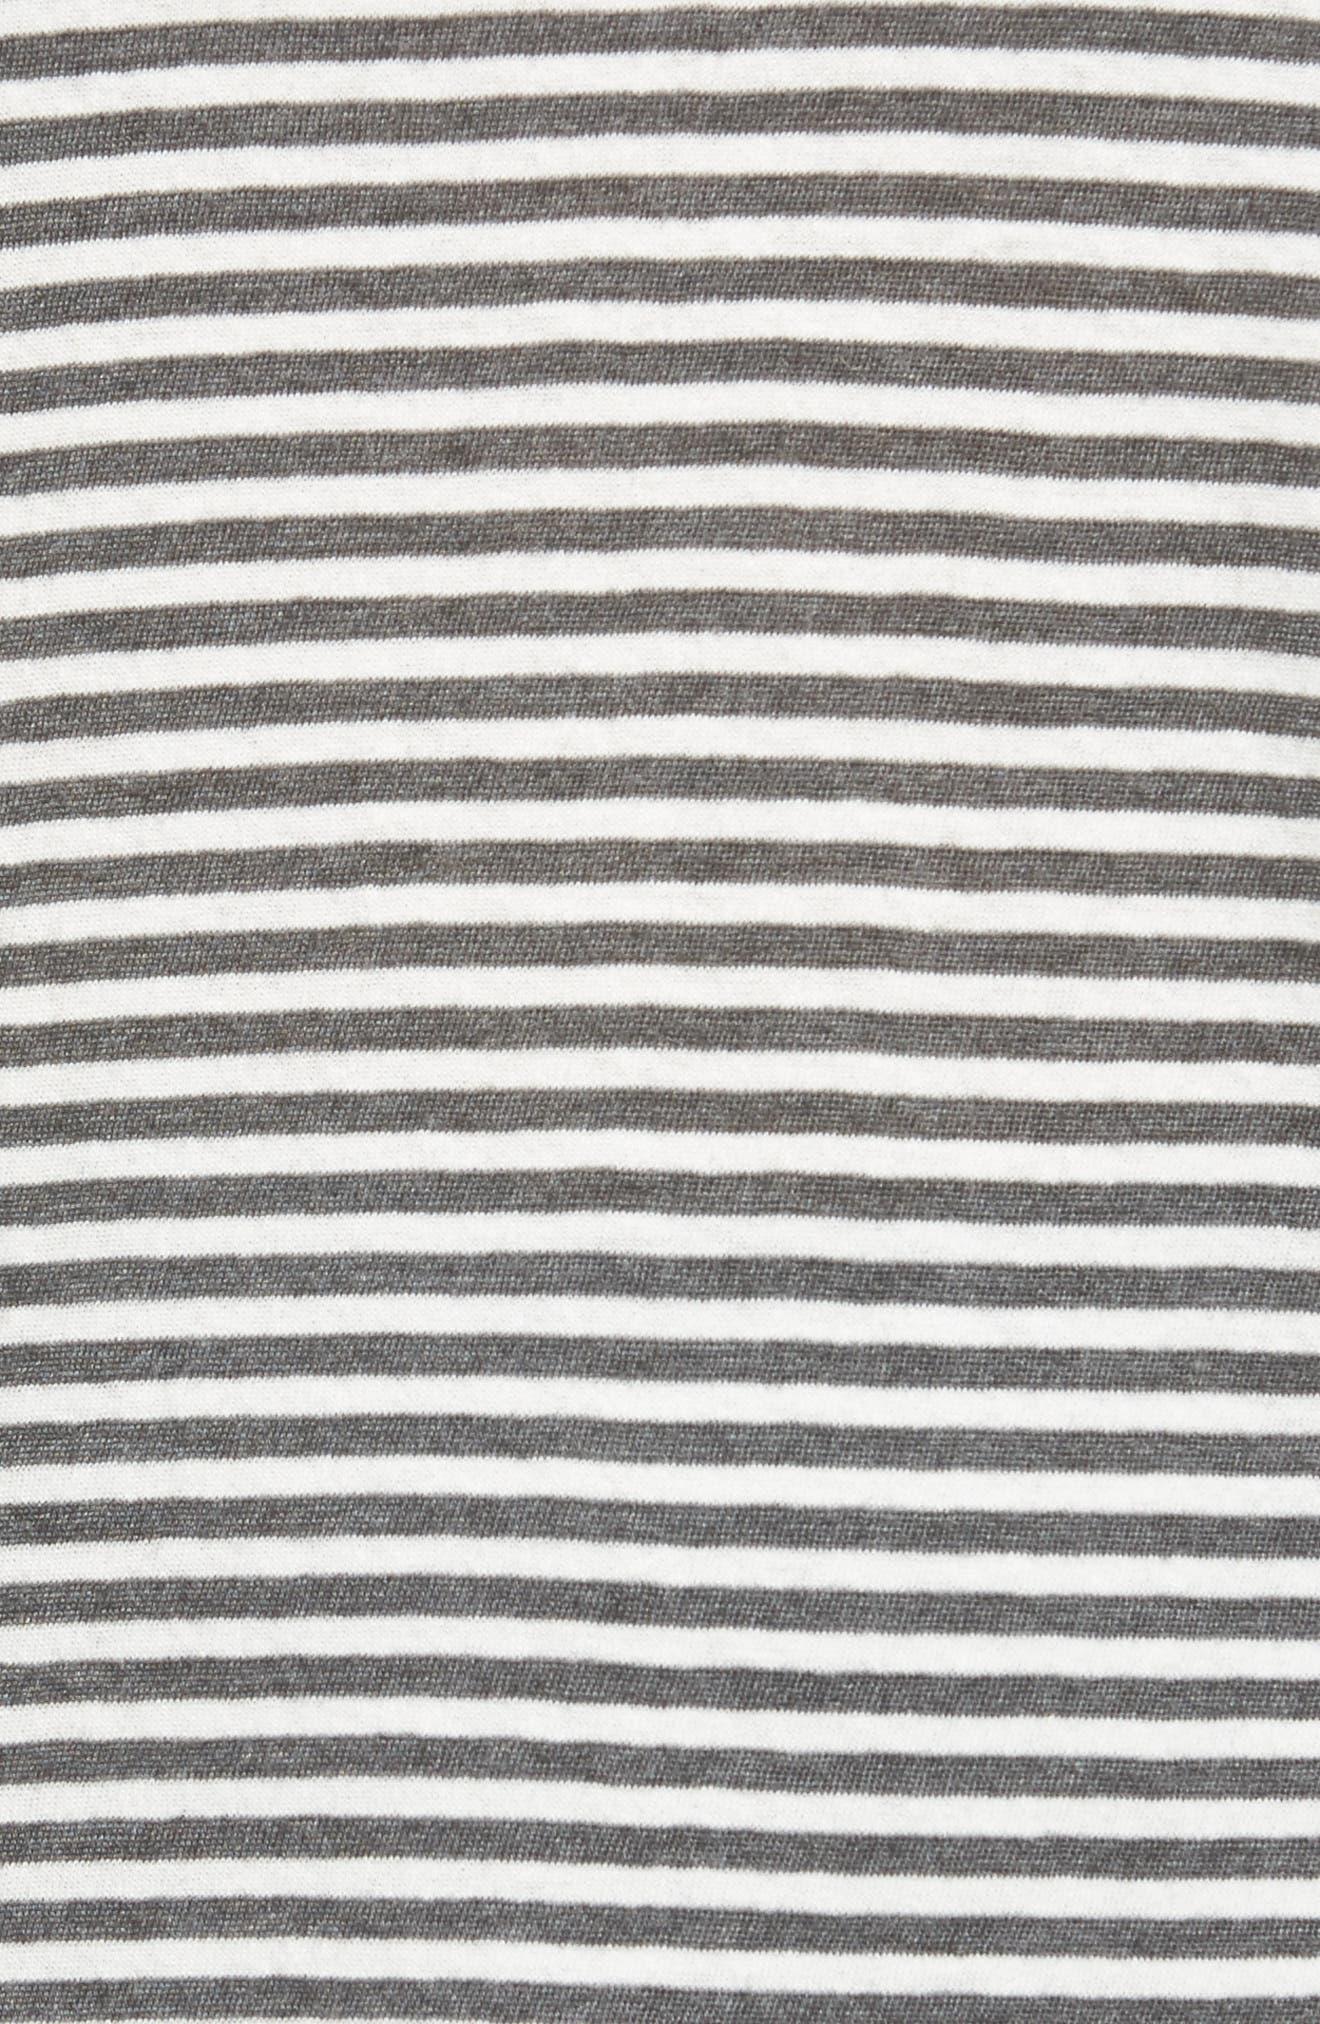 Stripe Long Layering Tank,                             Alternate thumbnail 5, color,                             Carbon Stripe